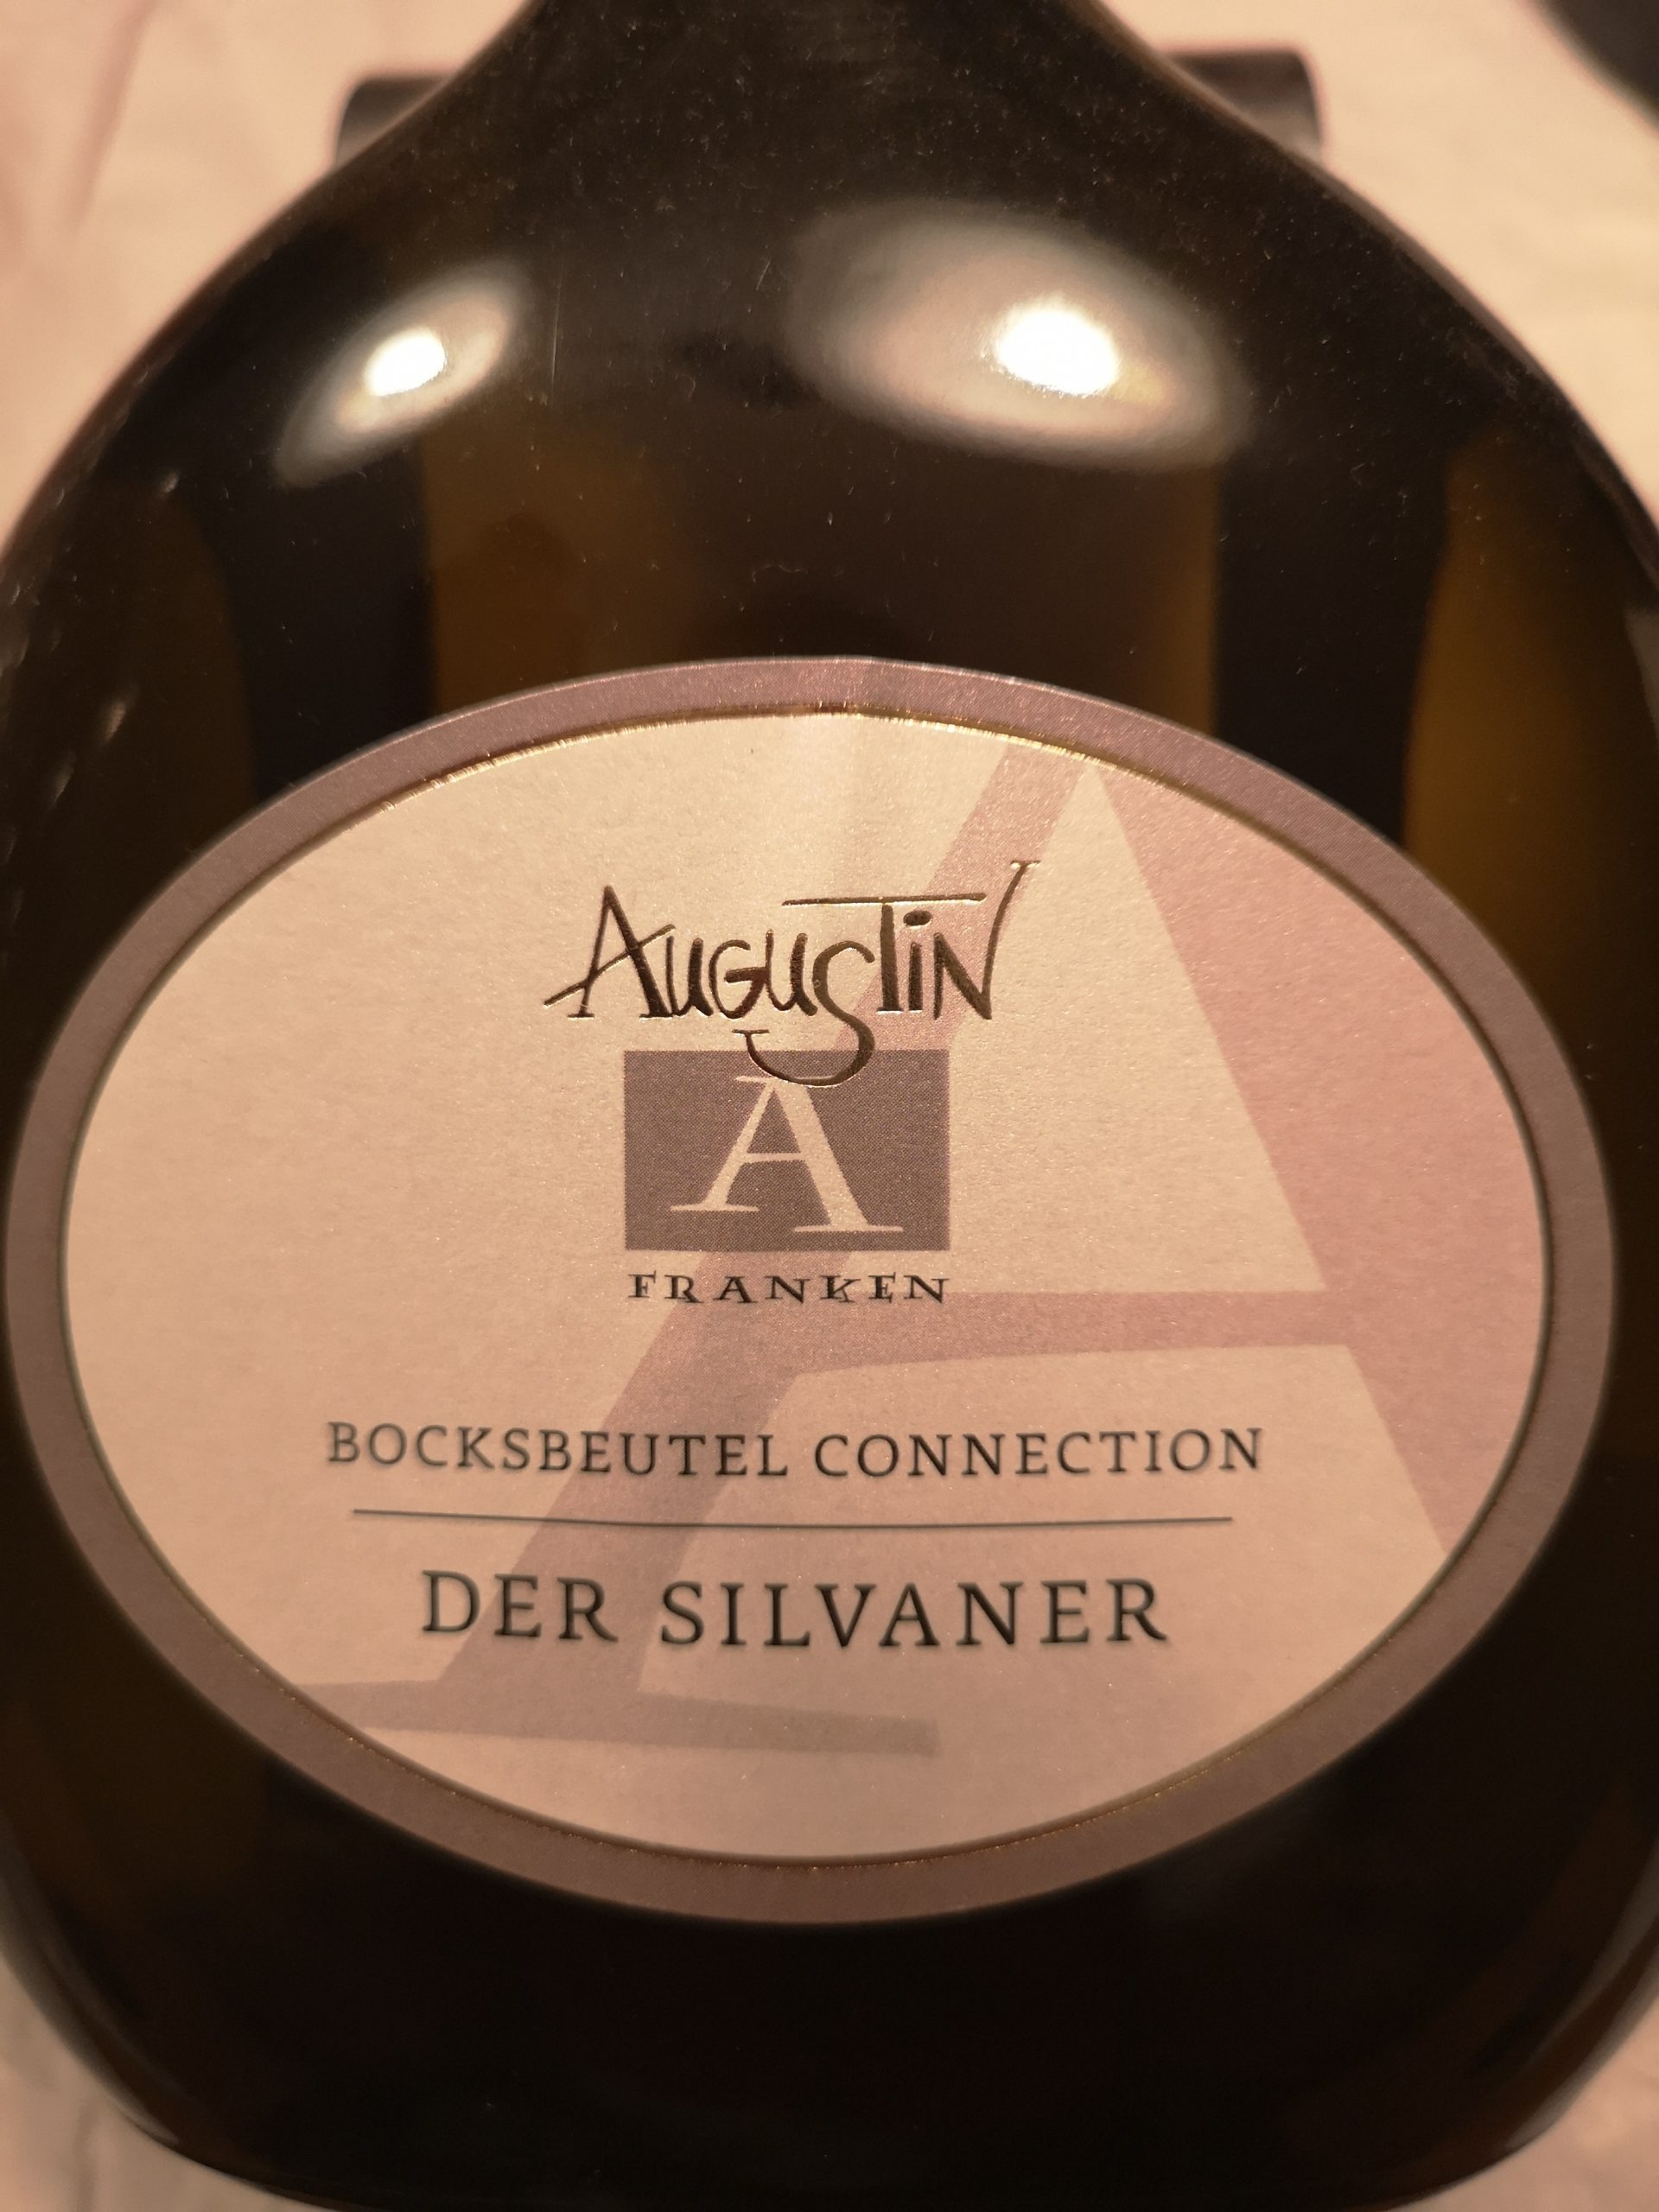 2012 Silvaner 'Der Silvaner' | Augustin